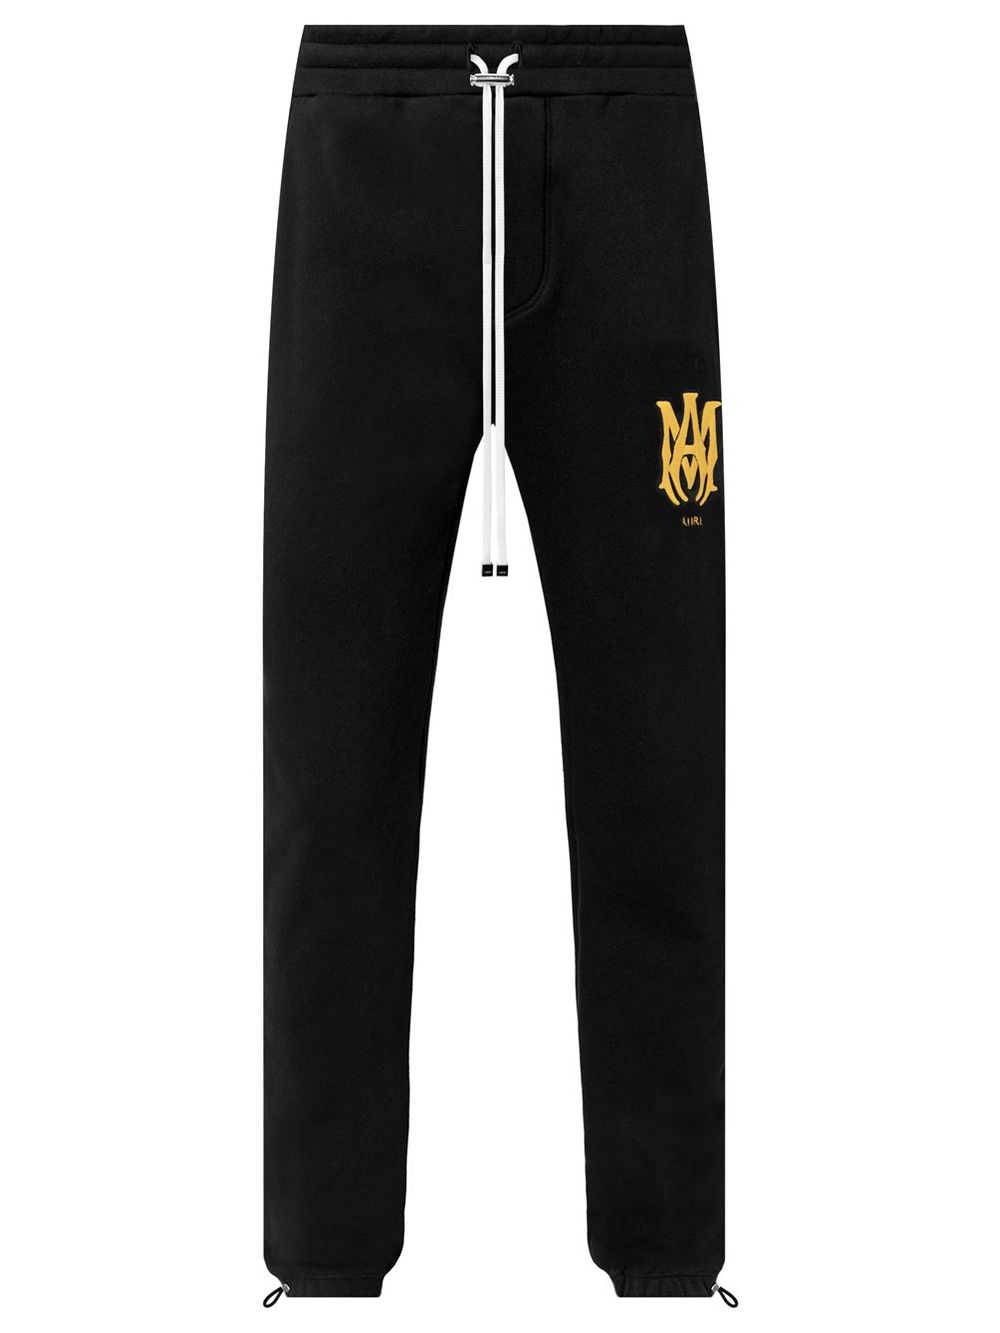 Classic Logo Sweatpants Black And Gold